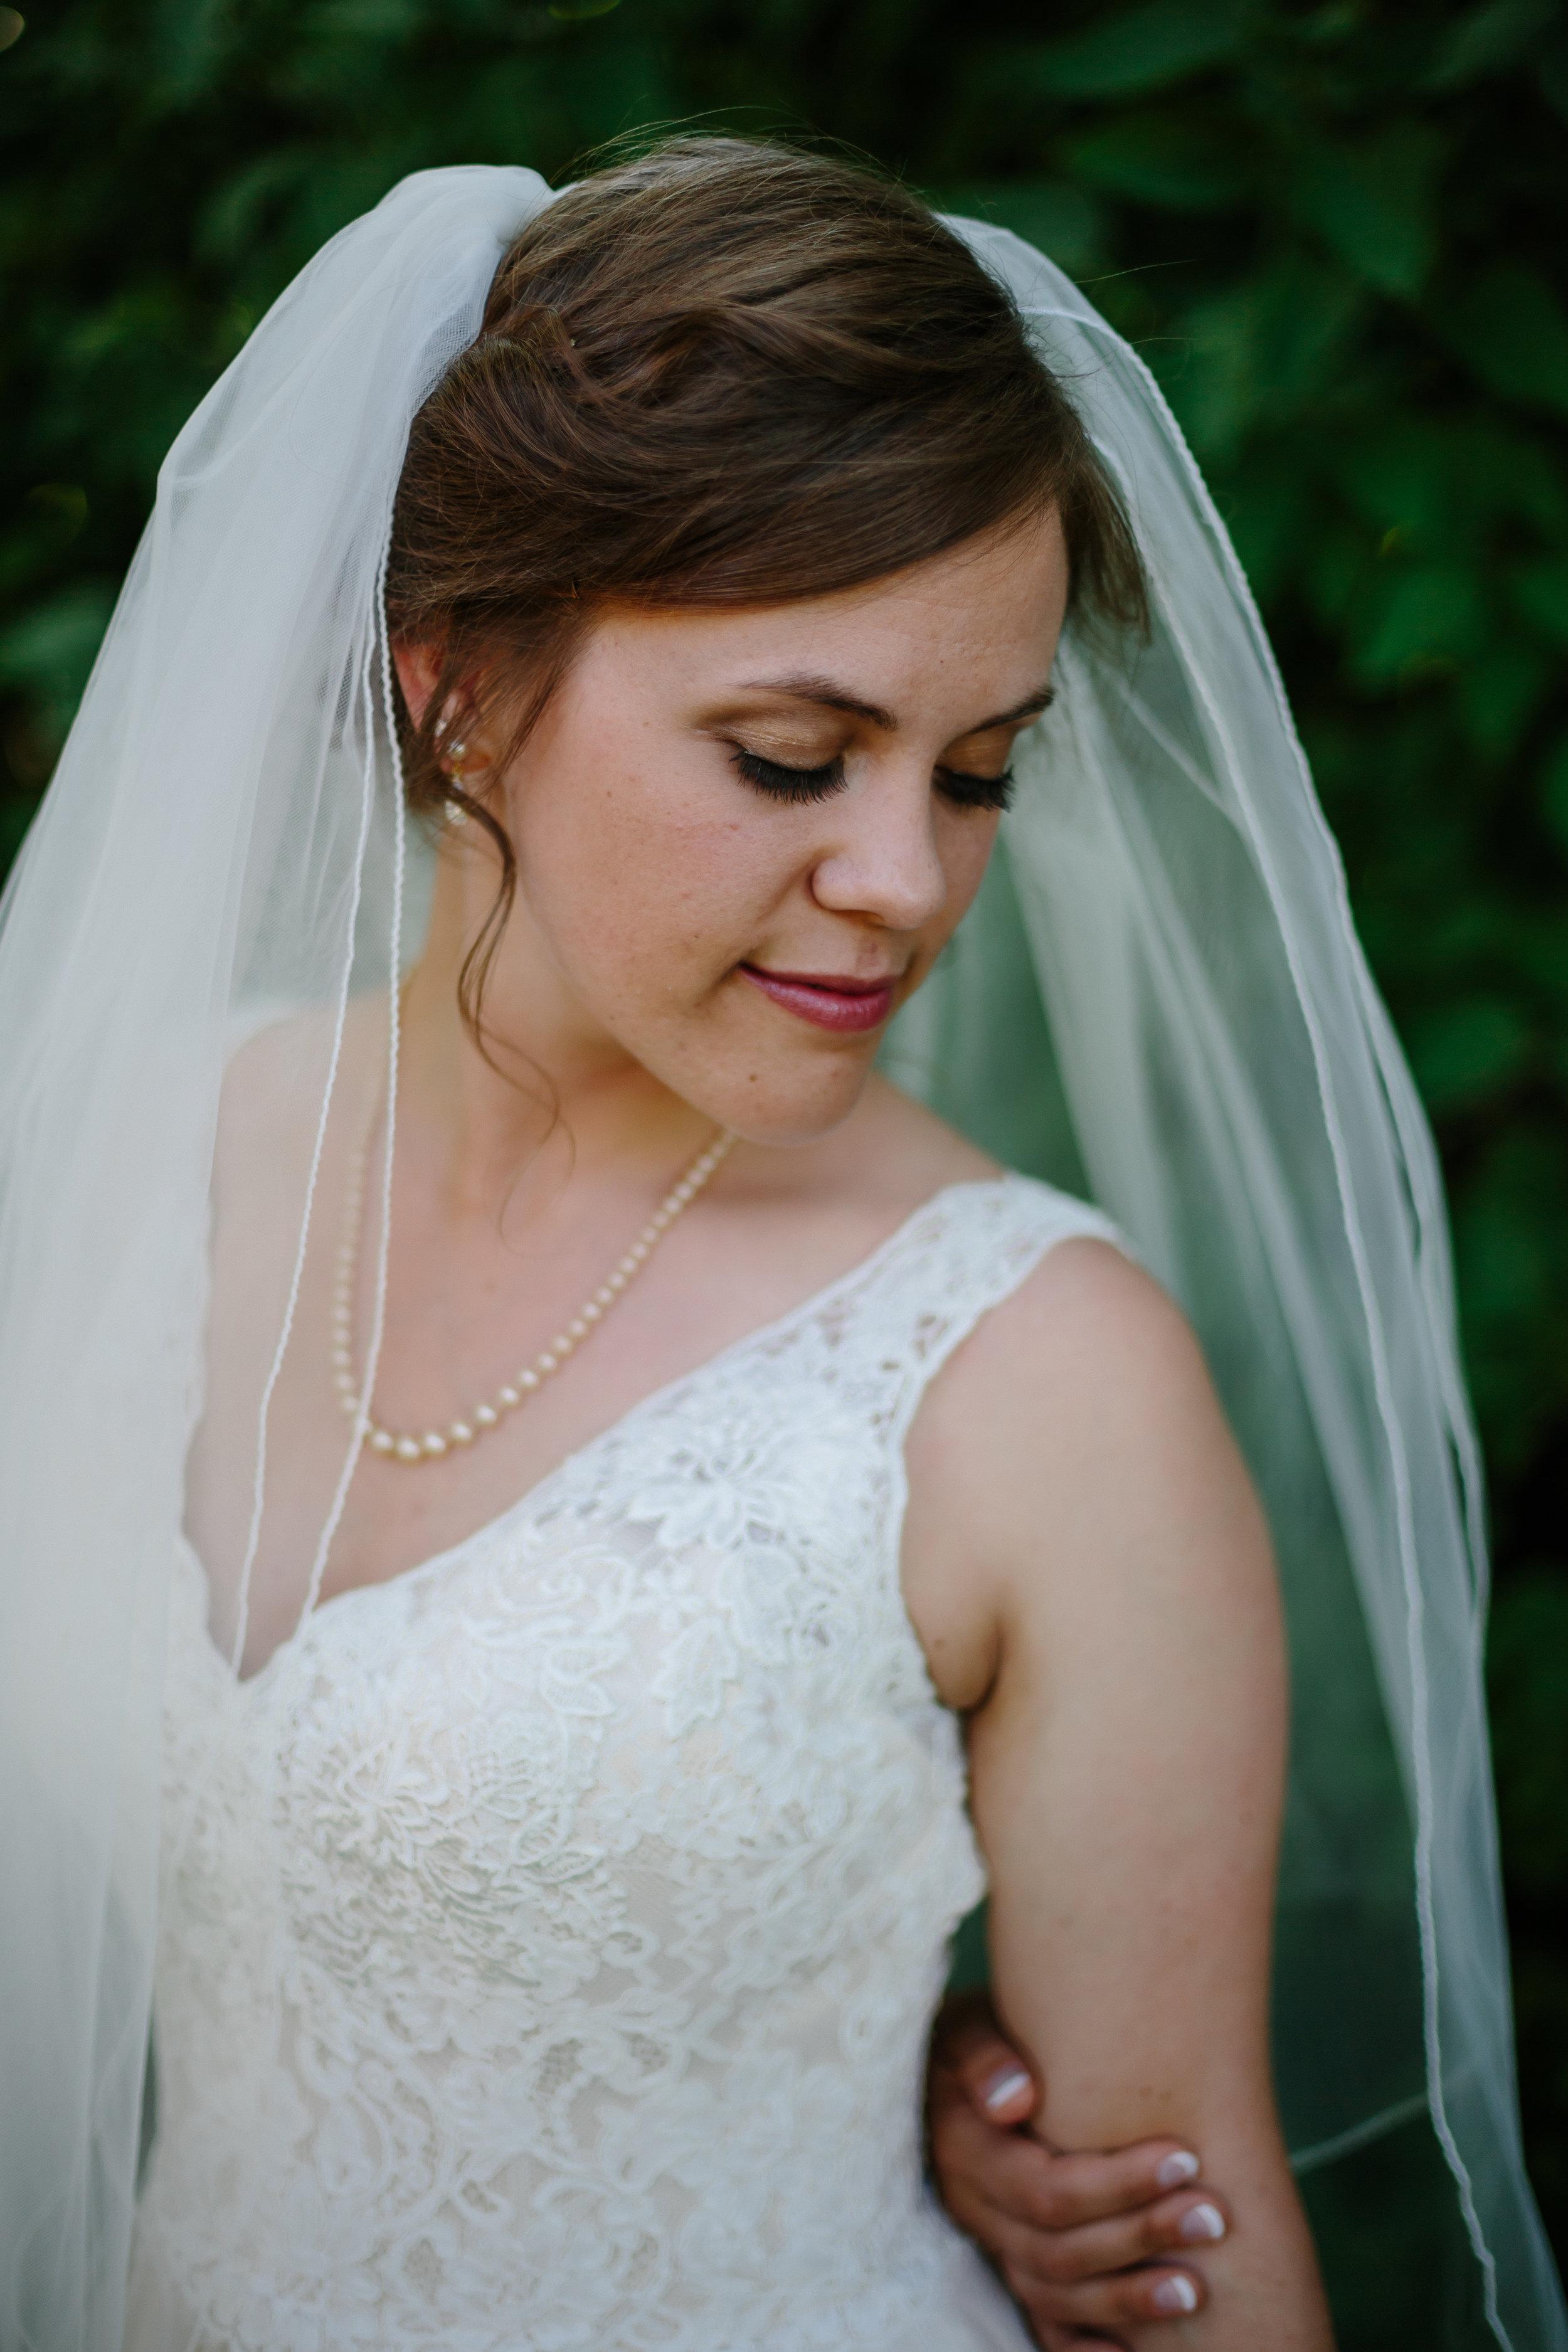 Jordan & Shantel Married - Idaho - Corrie Mick Photography-182.jpg